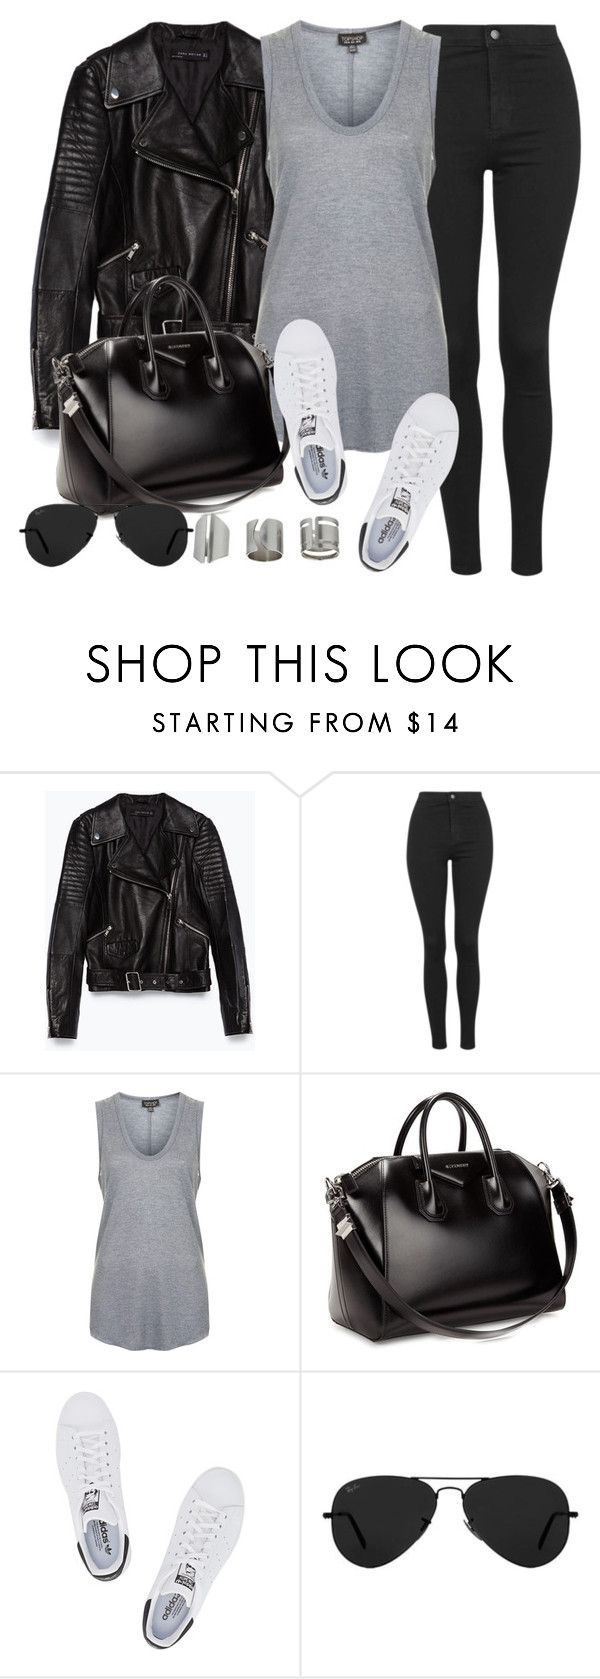 """Style #10080"" by vany-alvarado ❤ liked on Polyvore featuring Zara, Topshop, Givenchy, adidas Originals and Ray-Ban"